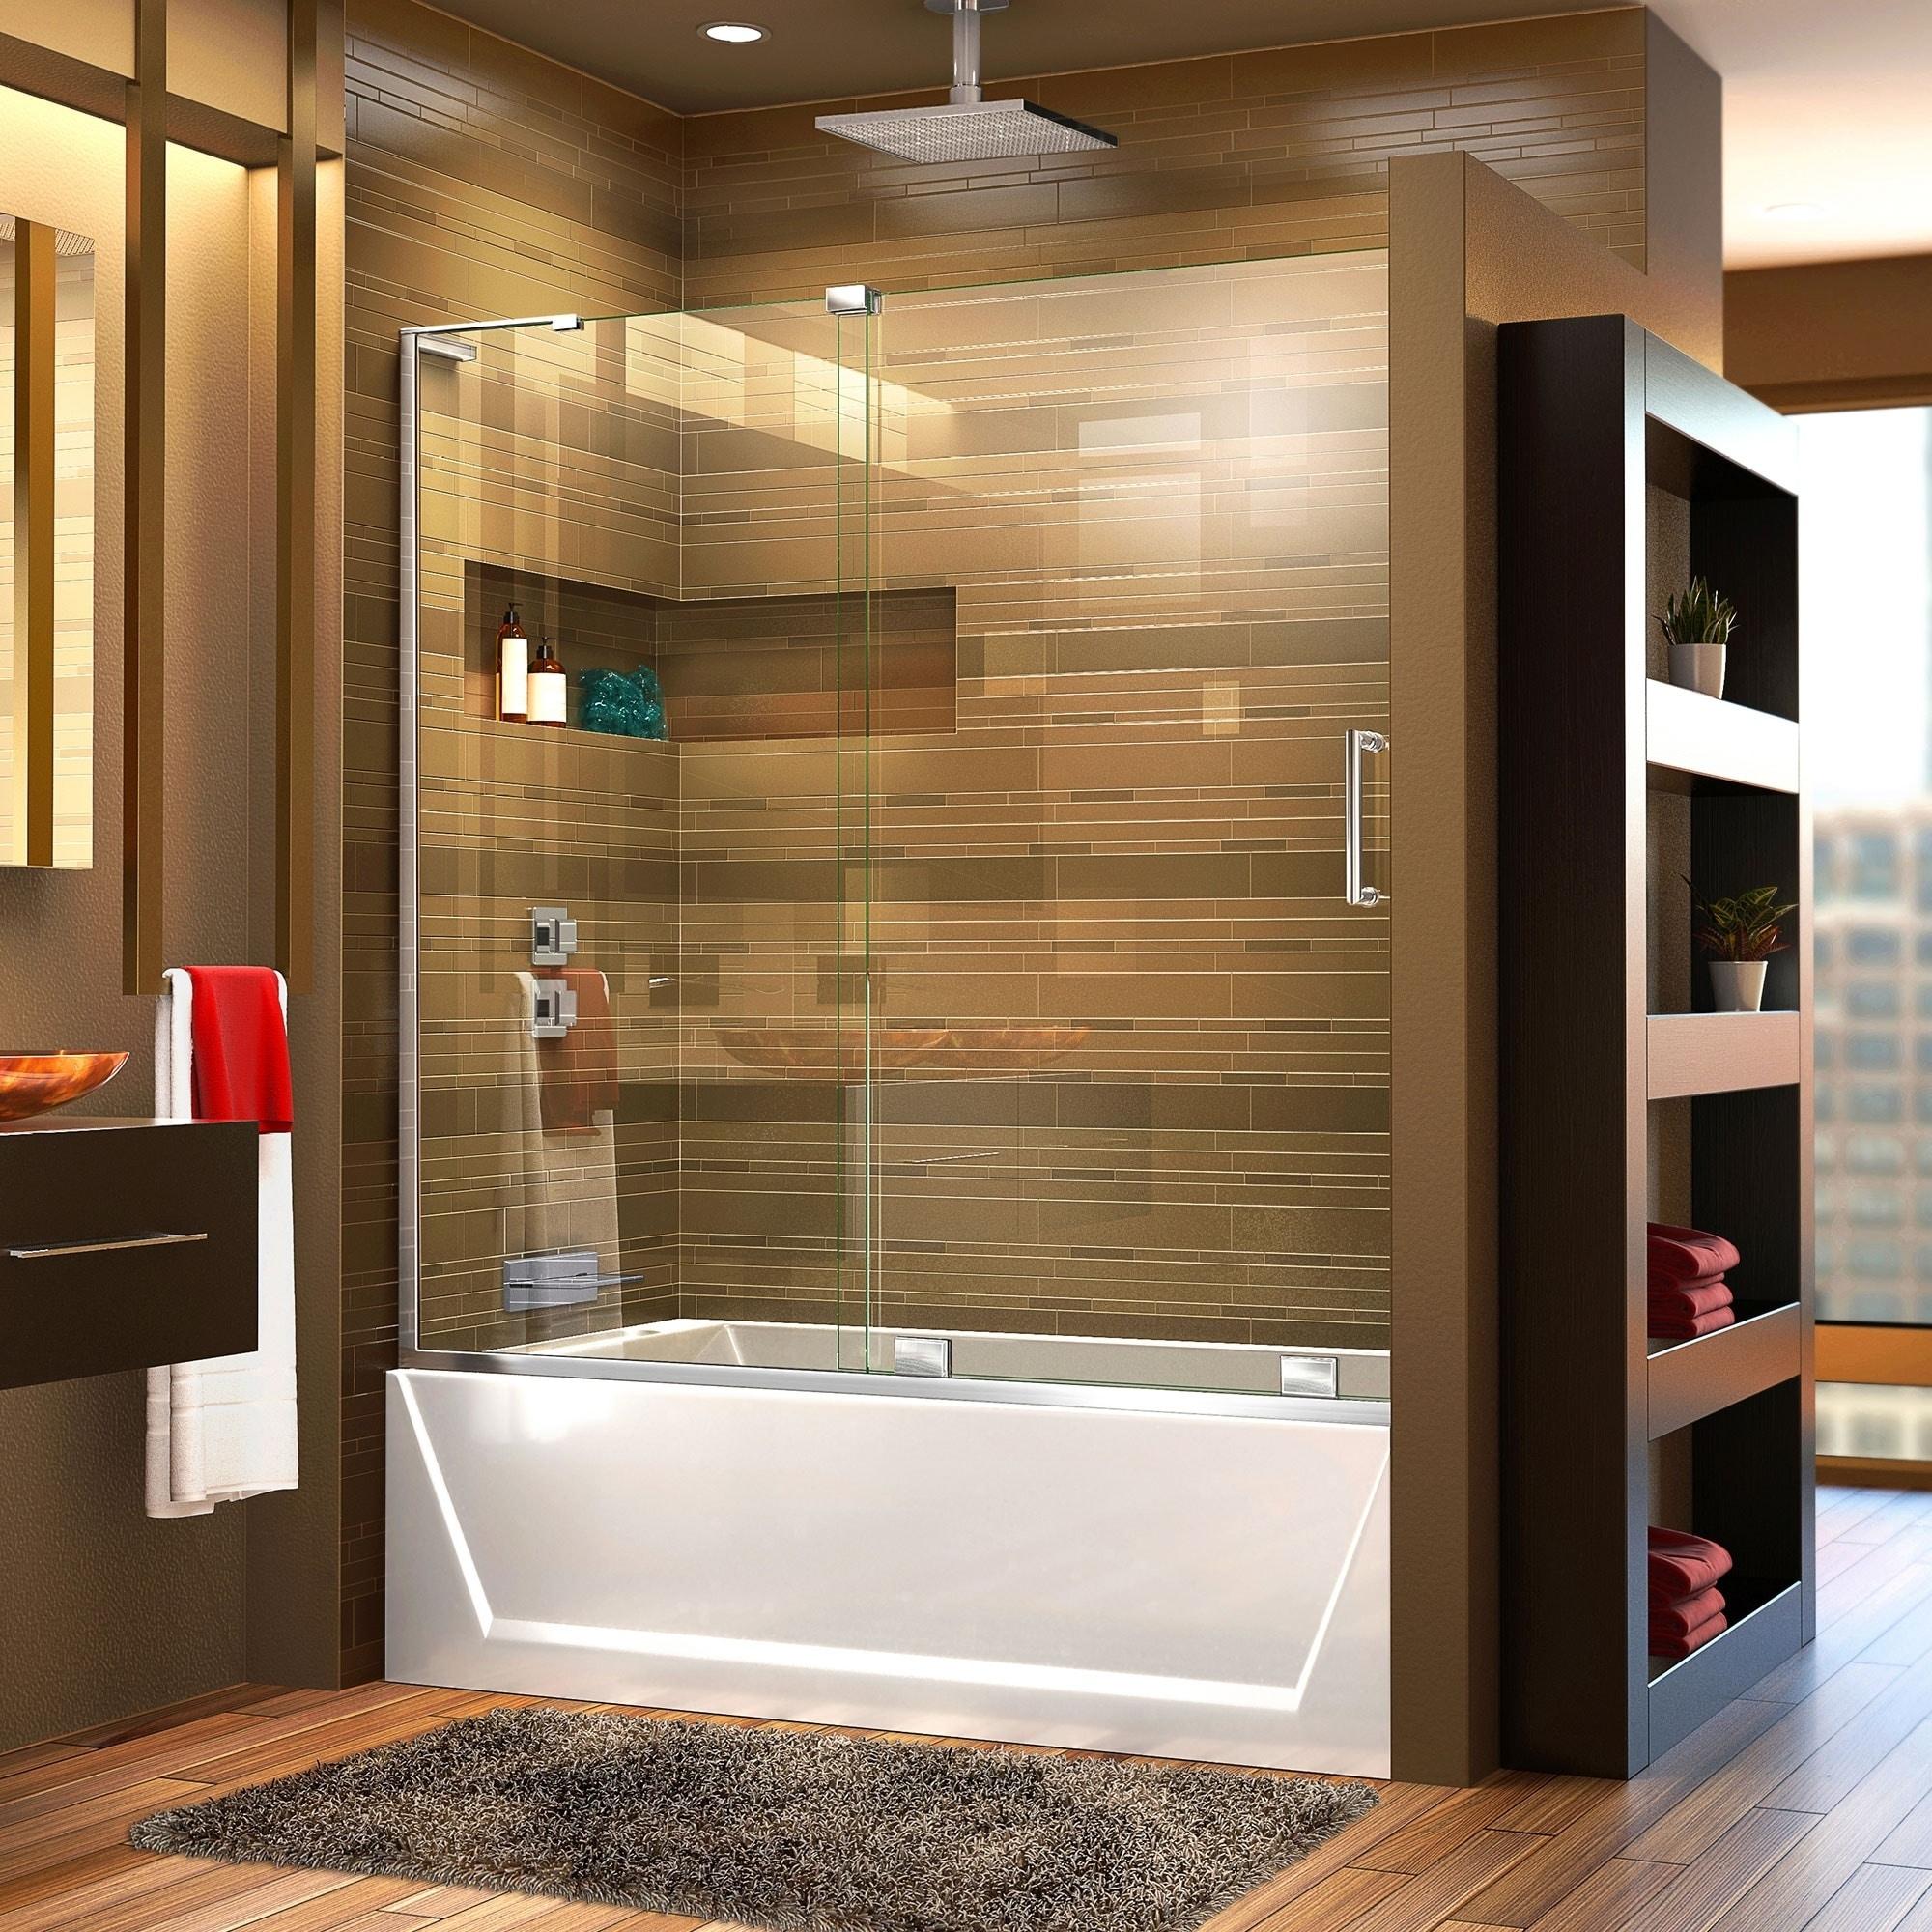 Buy Bathroom Shower Enclosures Series 8 Frameless Sliding Shower ...